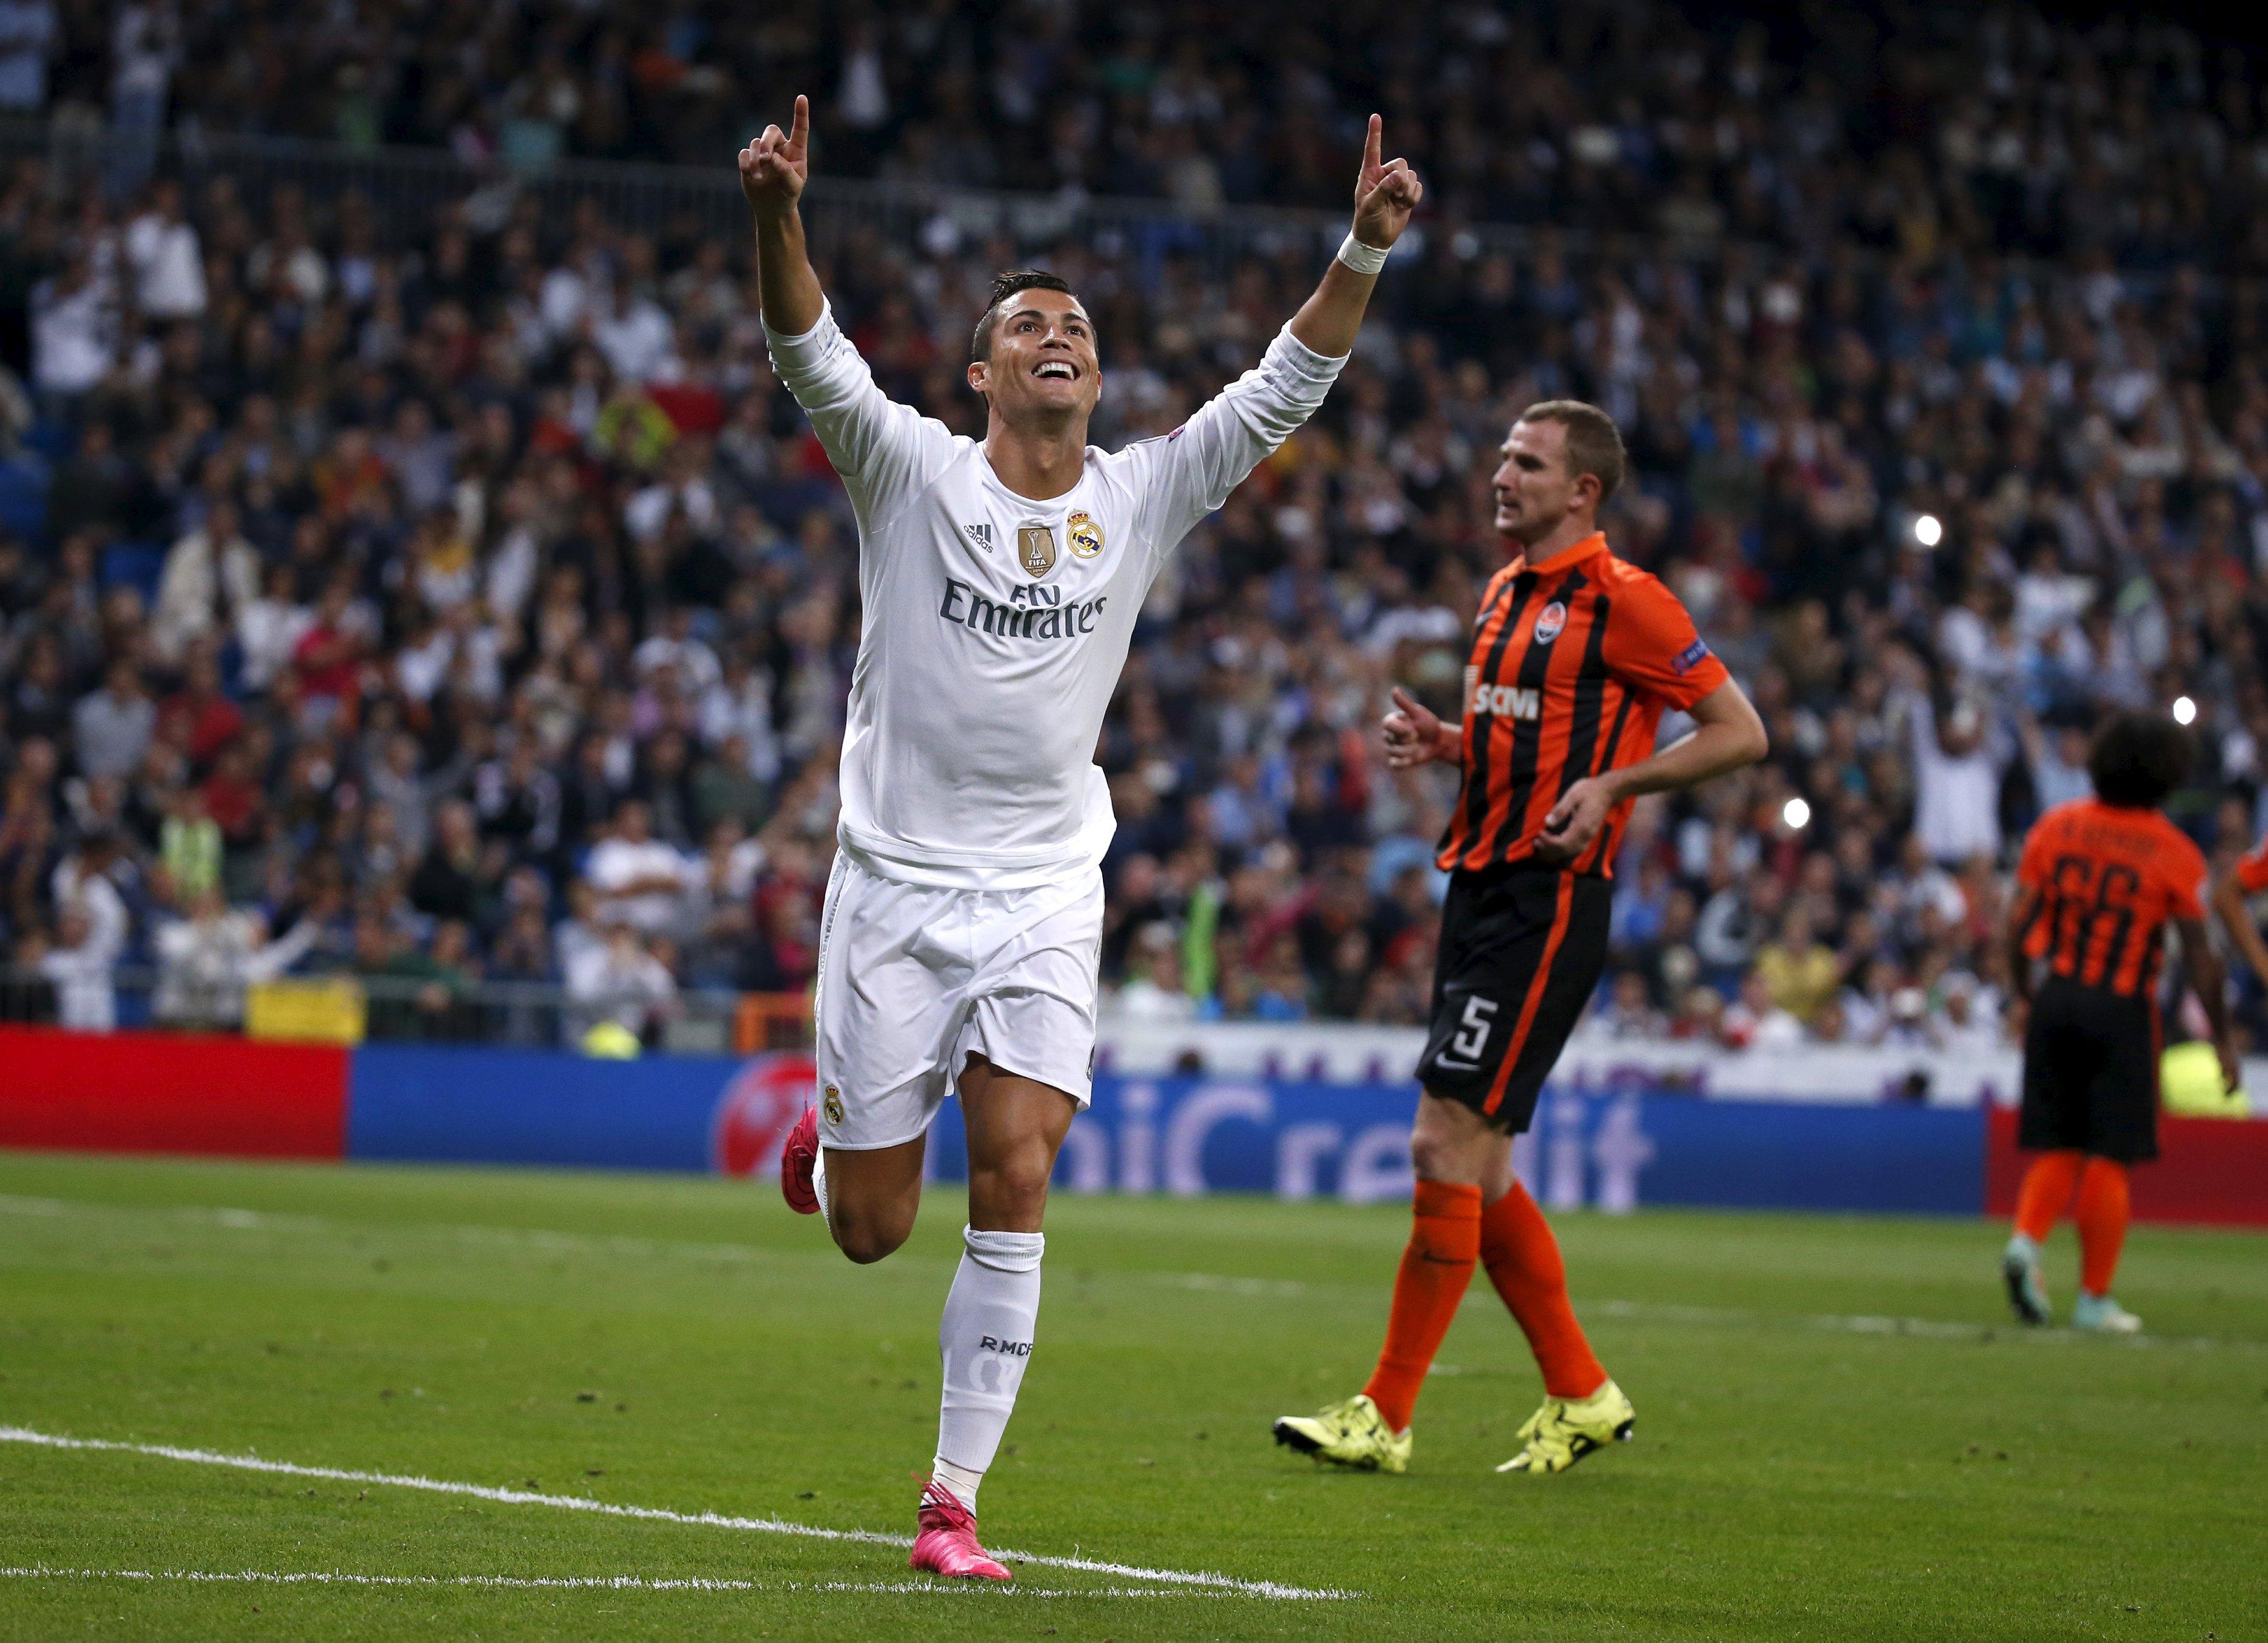 Real Madrid's Cristiano Ronaldo celebrates his second goal during their Champions League soccer match against Shakhtar Donetsk at Santiago Bernabeu stadium in Madrid, Spain, September 15, 2015. REUTERS/Juan Medina